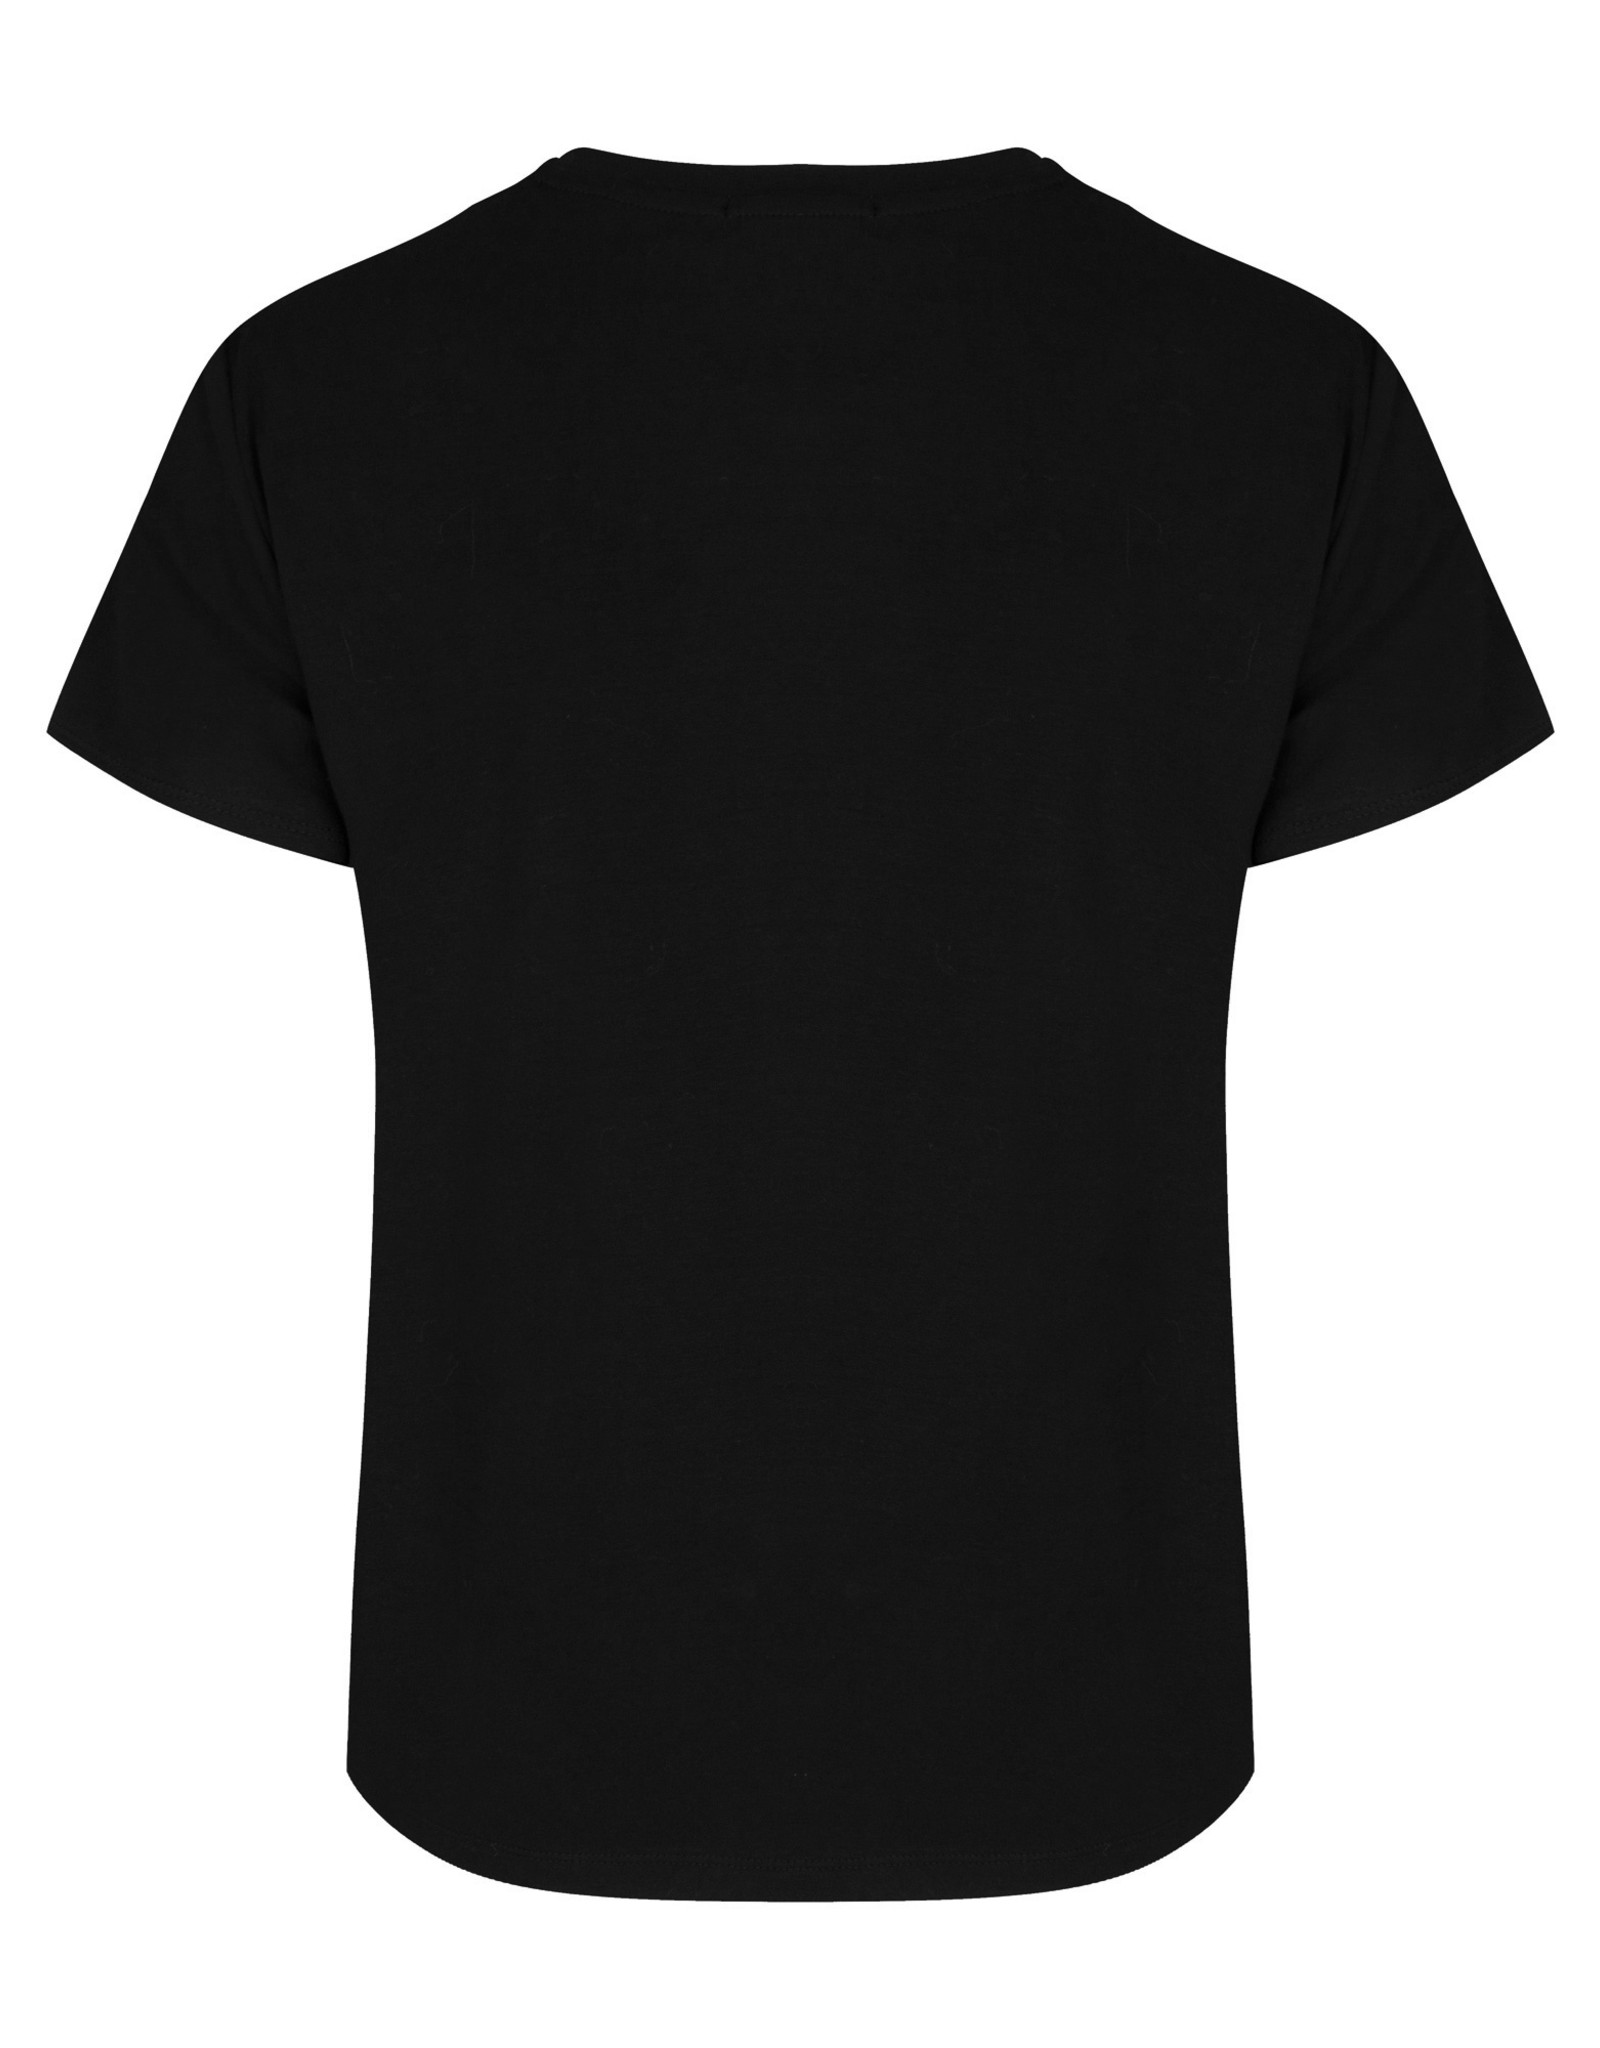 Ydence T-shirt - Je te vois